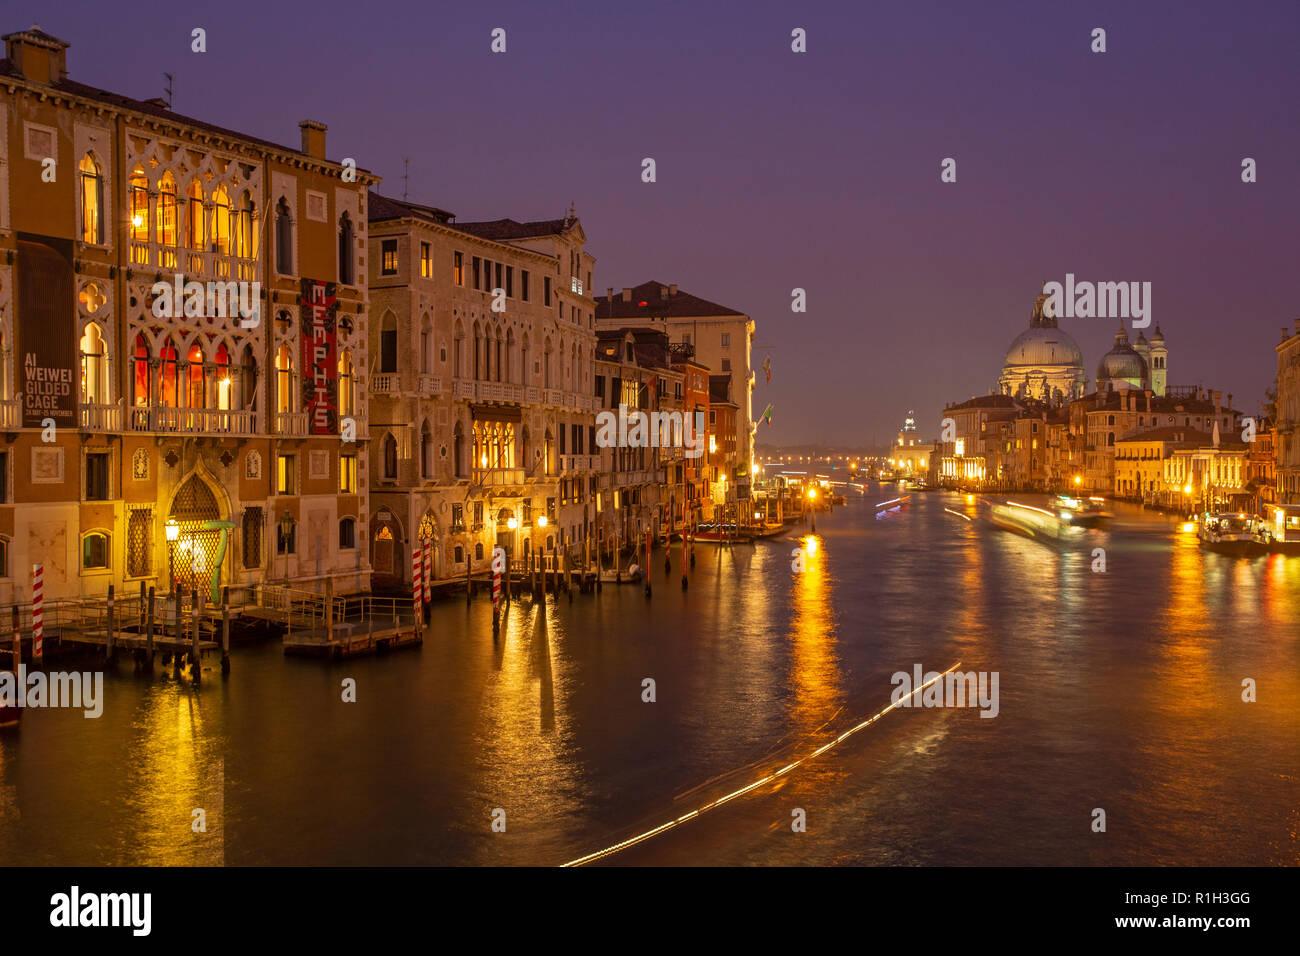 The Grand canal and the Basillica of Santa Maria della Salute viewed from Academia bridge in Venice at night - Stock Image